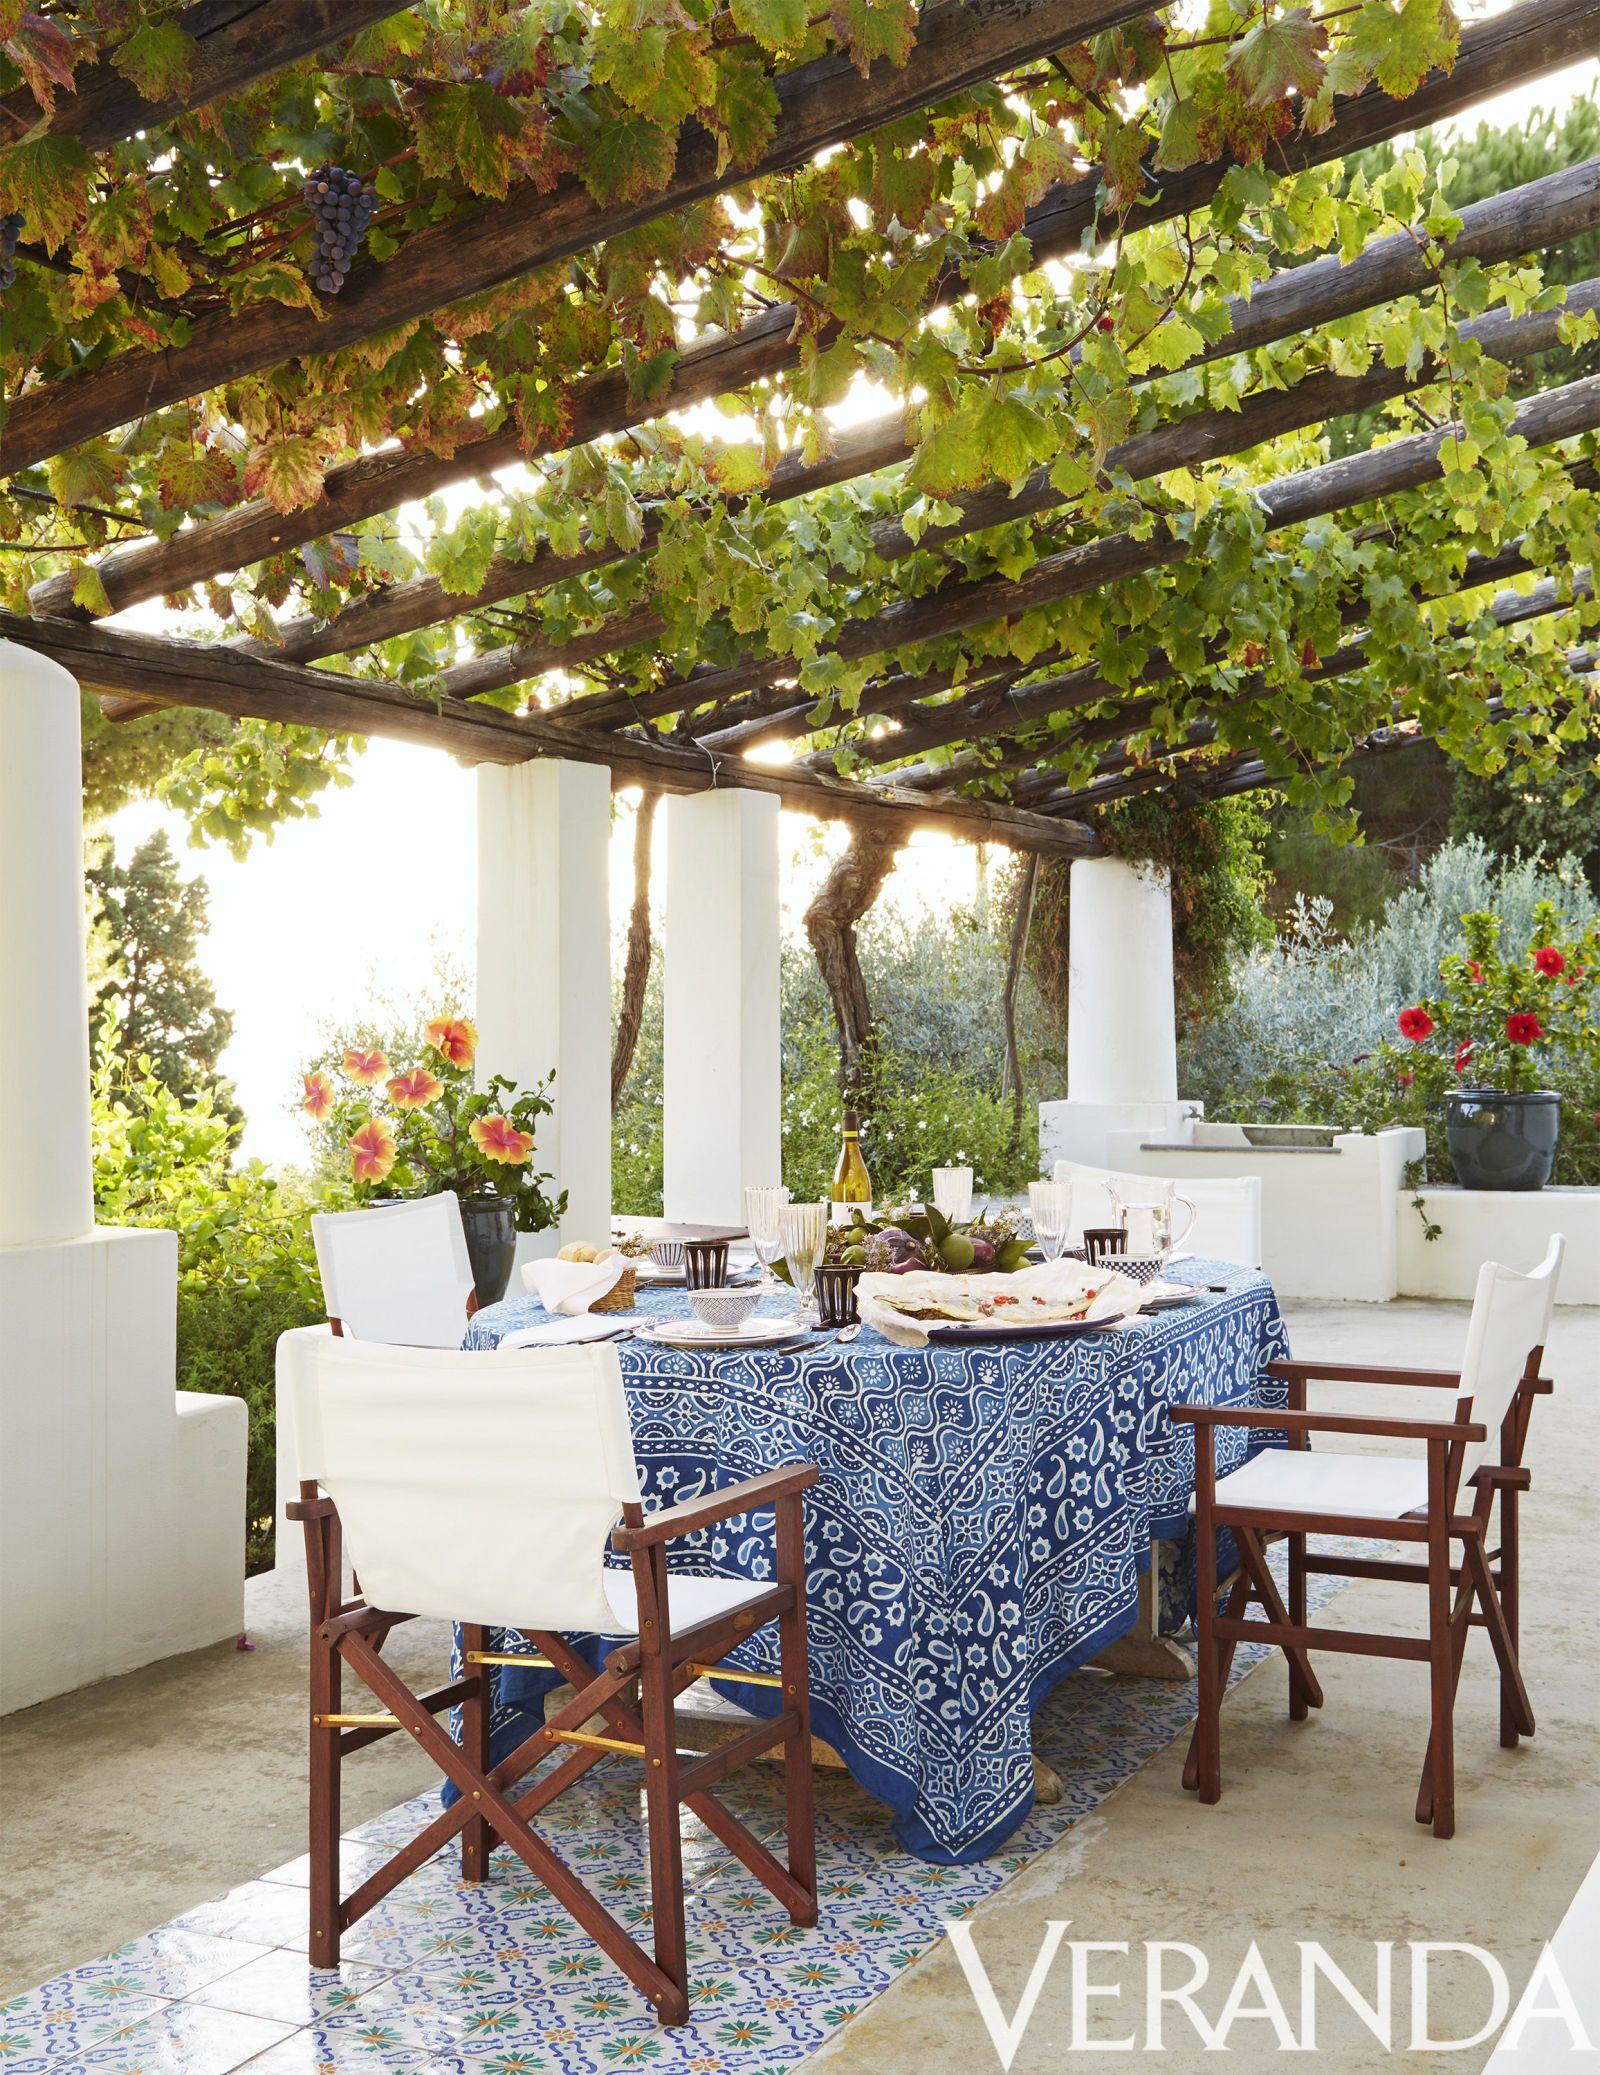 10 Stunning Outdoor Areas For Al Fresco